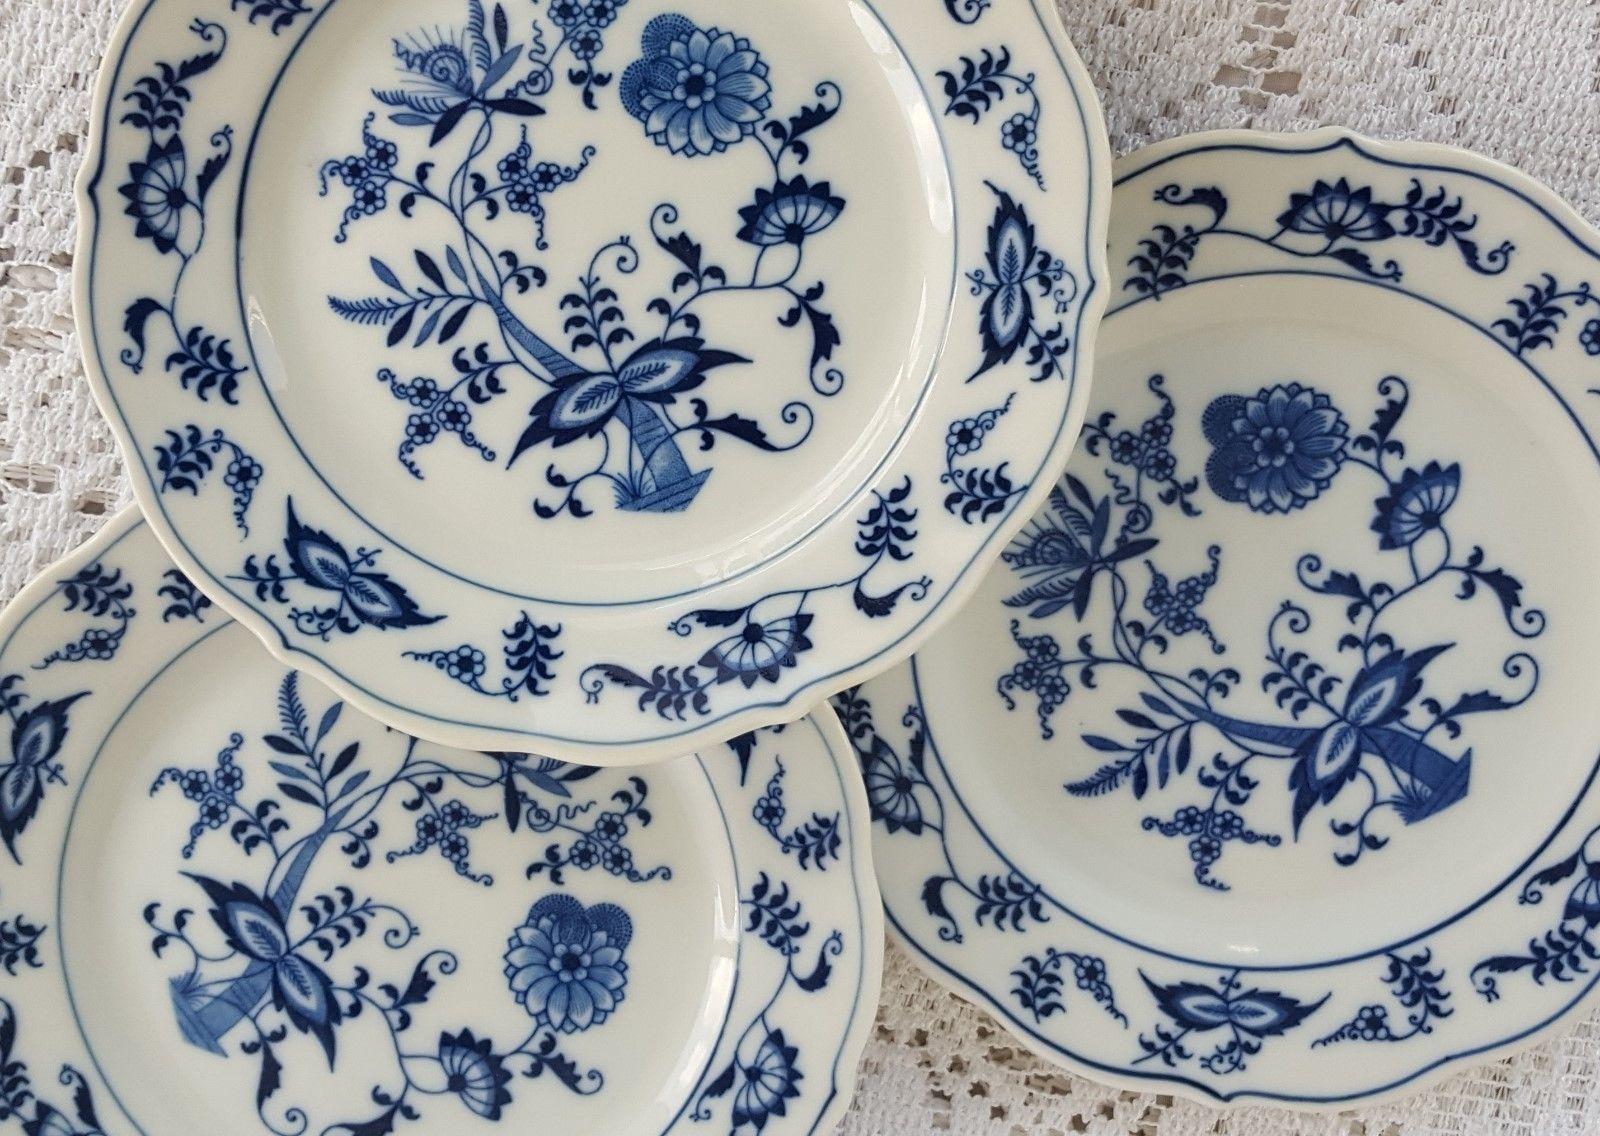 Set of 3 VIntage Blue Danube Bread \u0026 Butter Plates 1950\u0027s Banner Ribbon Onion - $14.99 & Blue Danube Plates (1950s): 1 listing